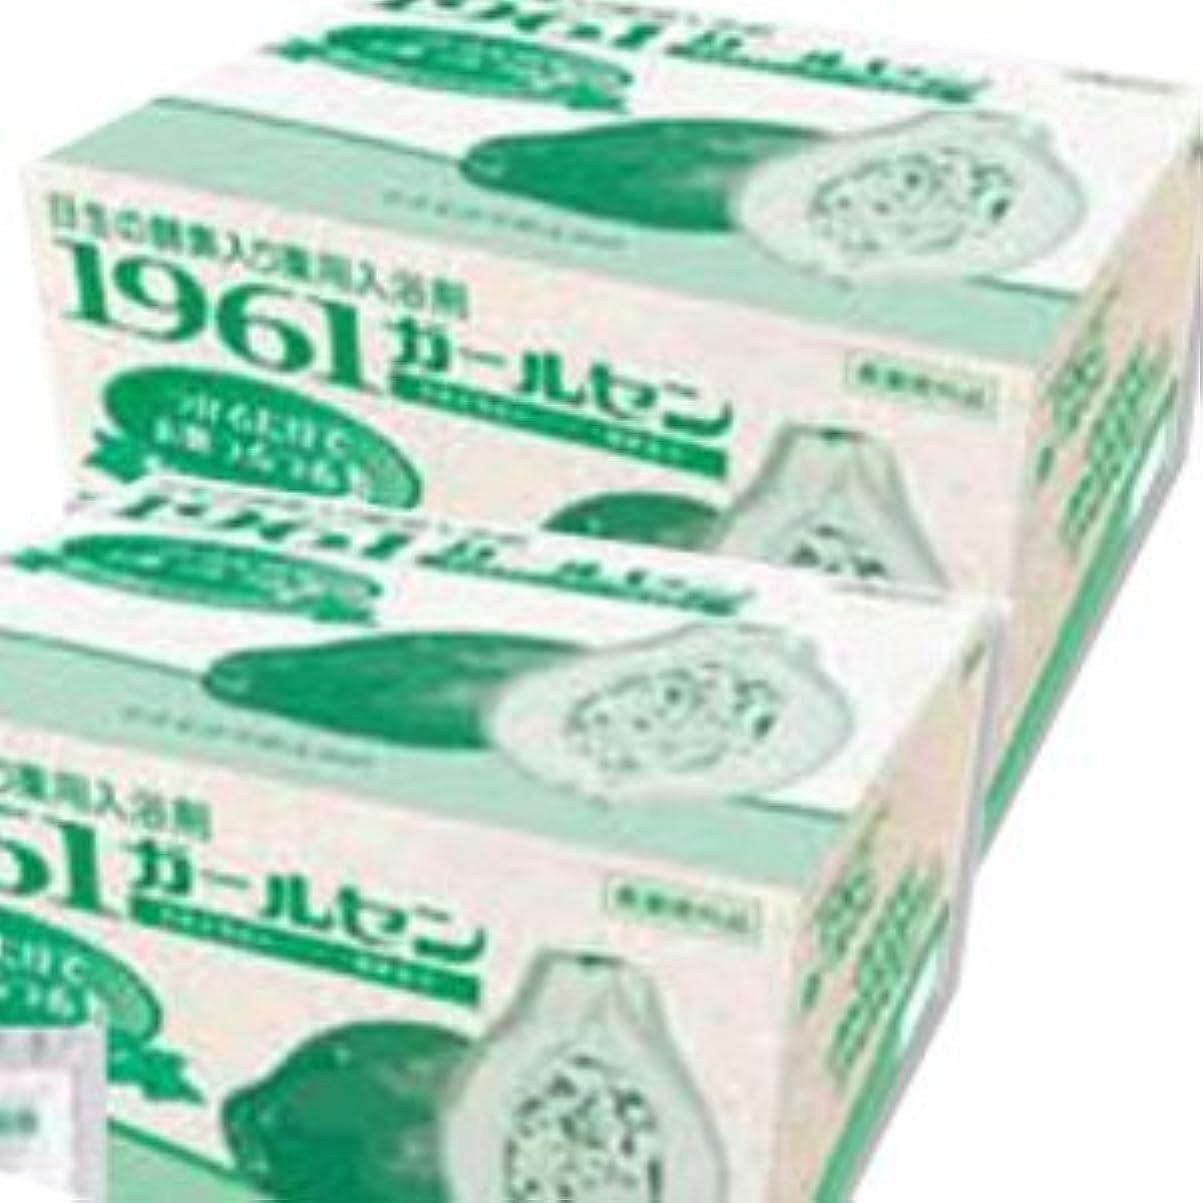 司教バッチ歩道日本生化学 薬用入浴剤 1961ガールセン (20g×60包)×2箱 (医薬部外品)